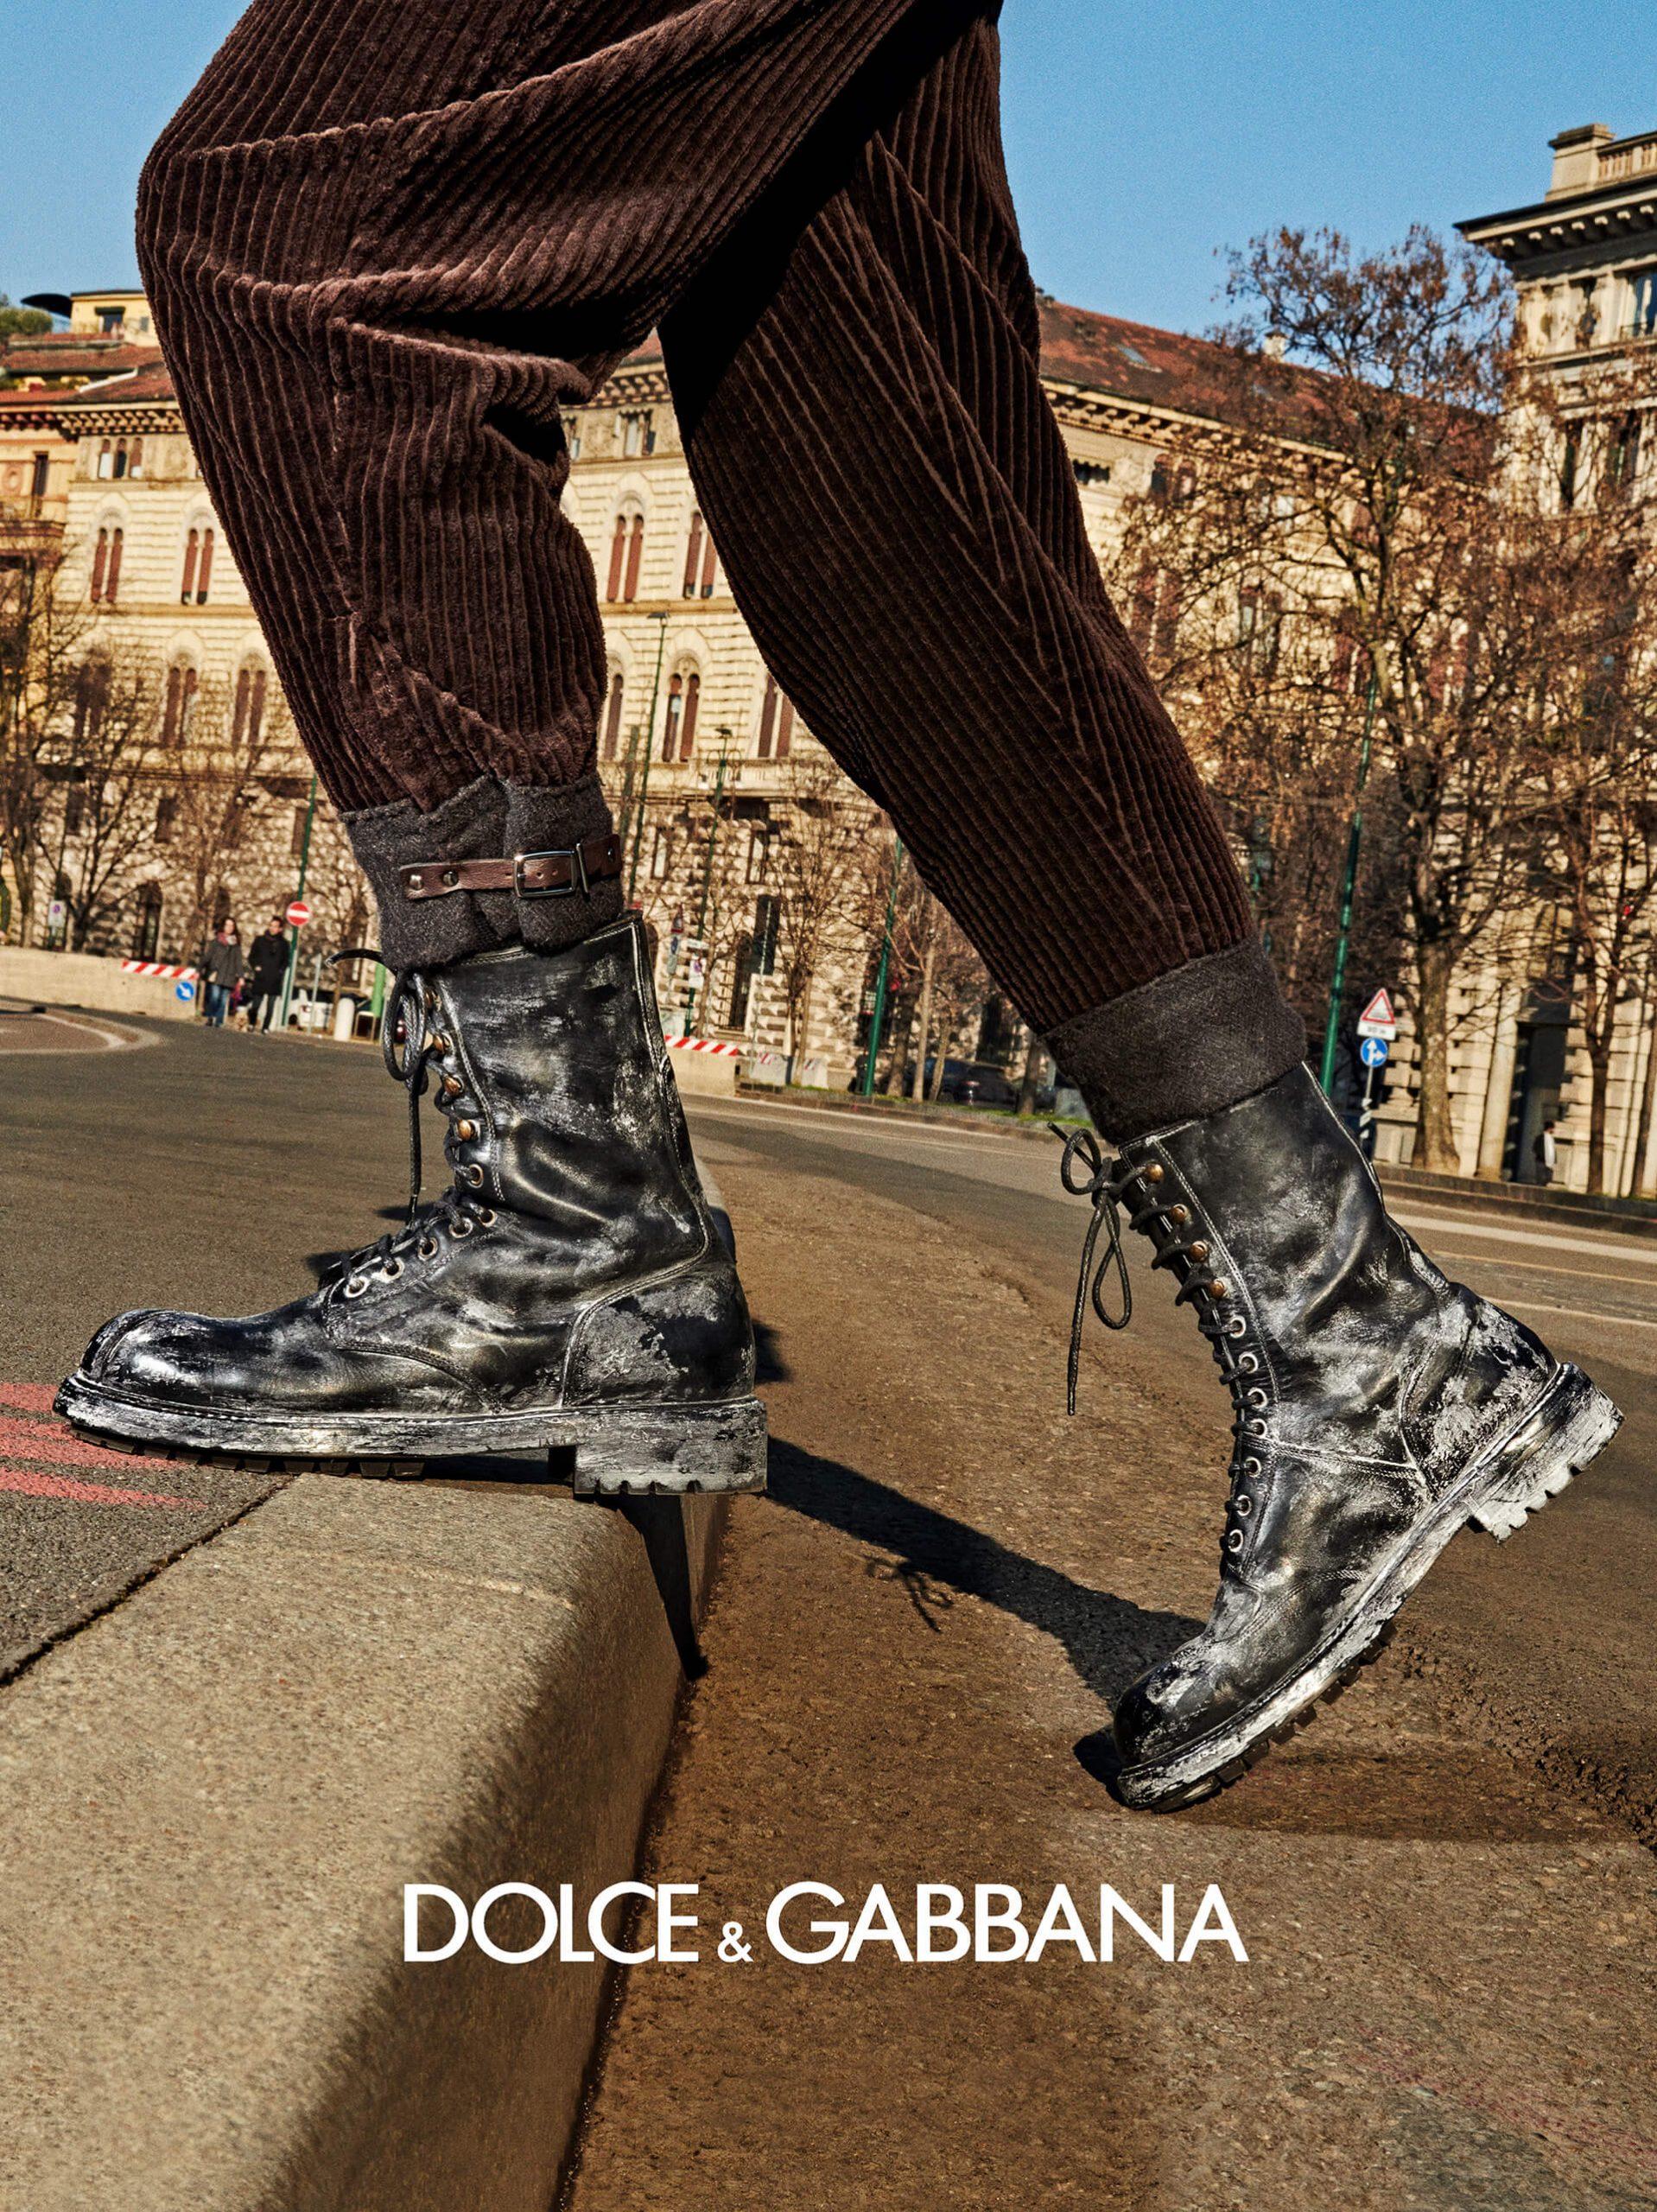 Dolce & Gabbana Fall 2020 Ad Campaign Photos